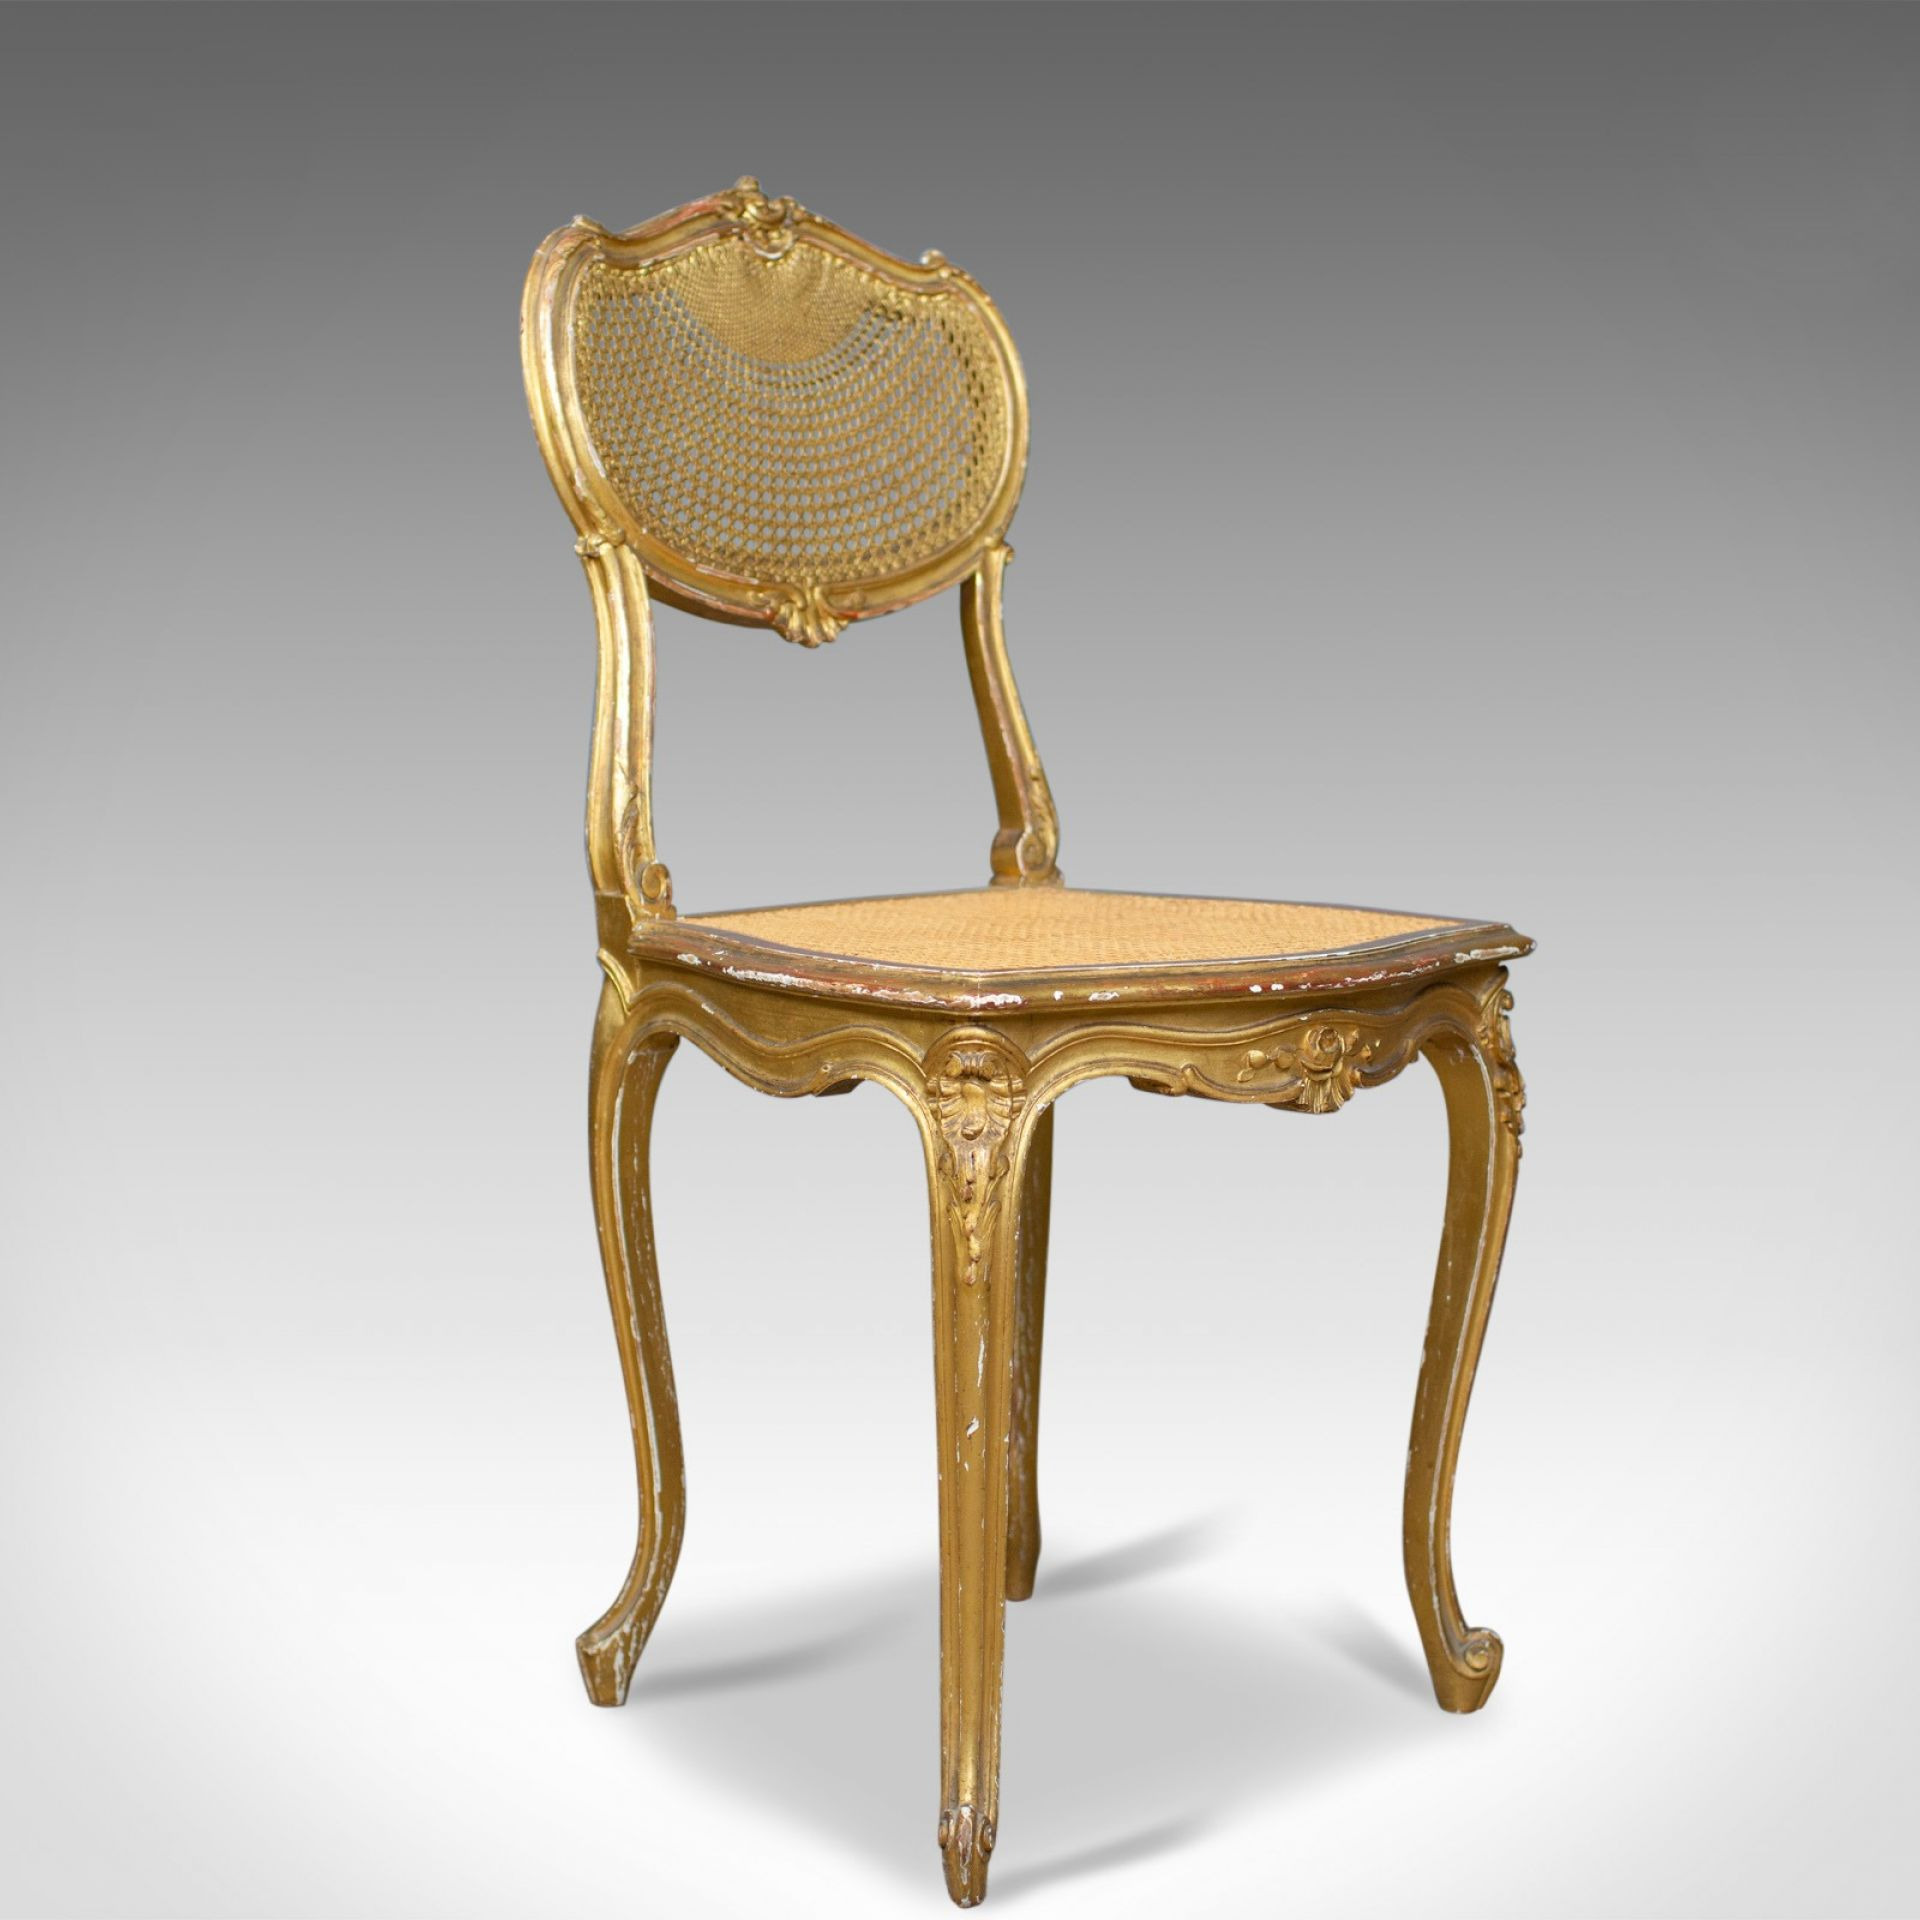 Antique Louis XV Revival Salon Chairs, French, Giltwood, Cane, C19th, Circa 1900